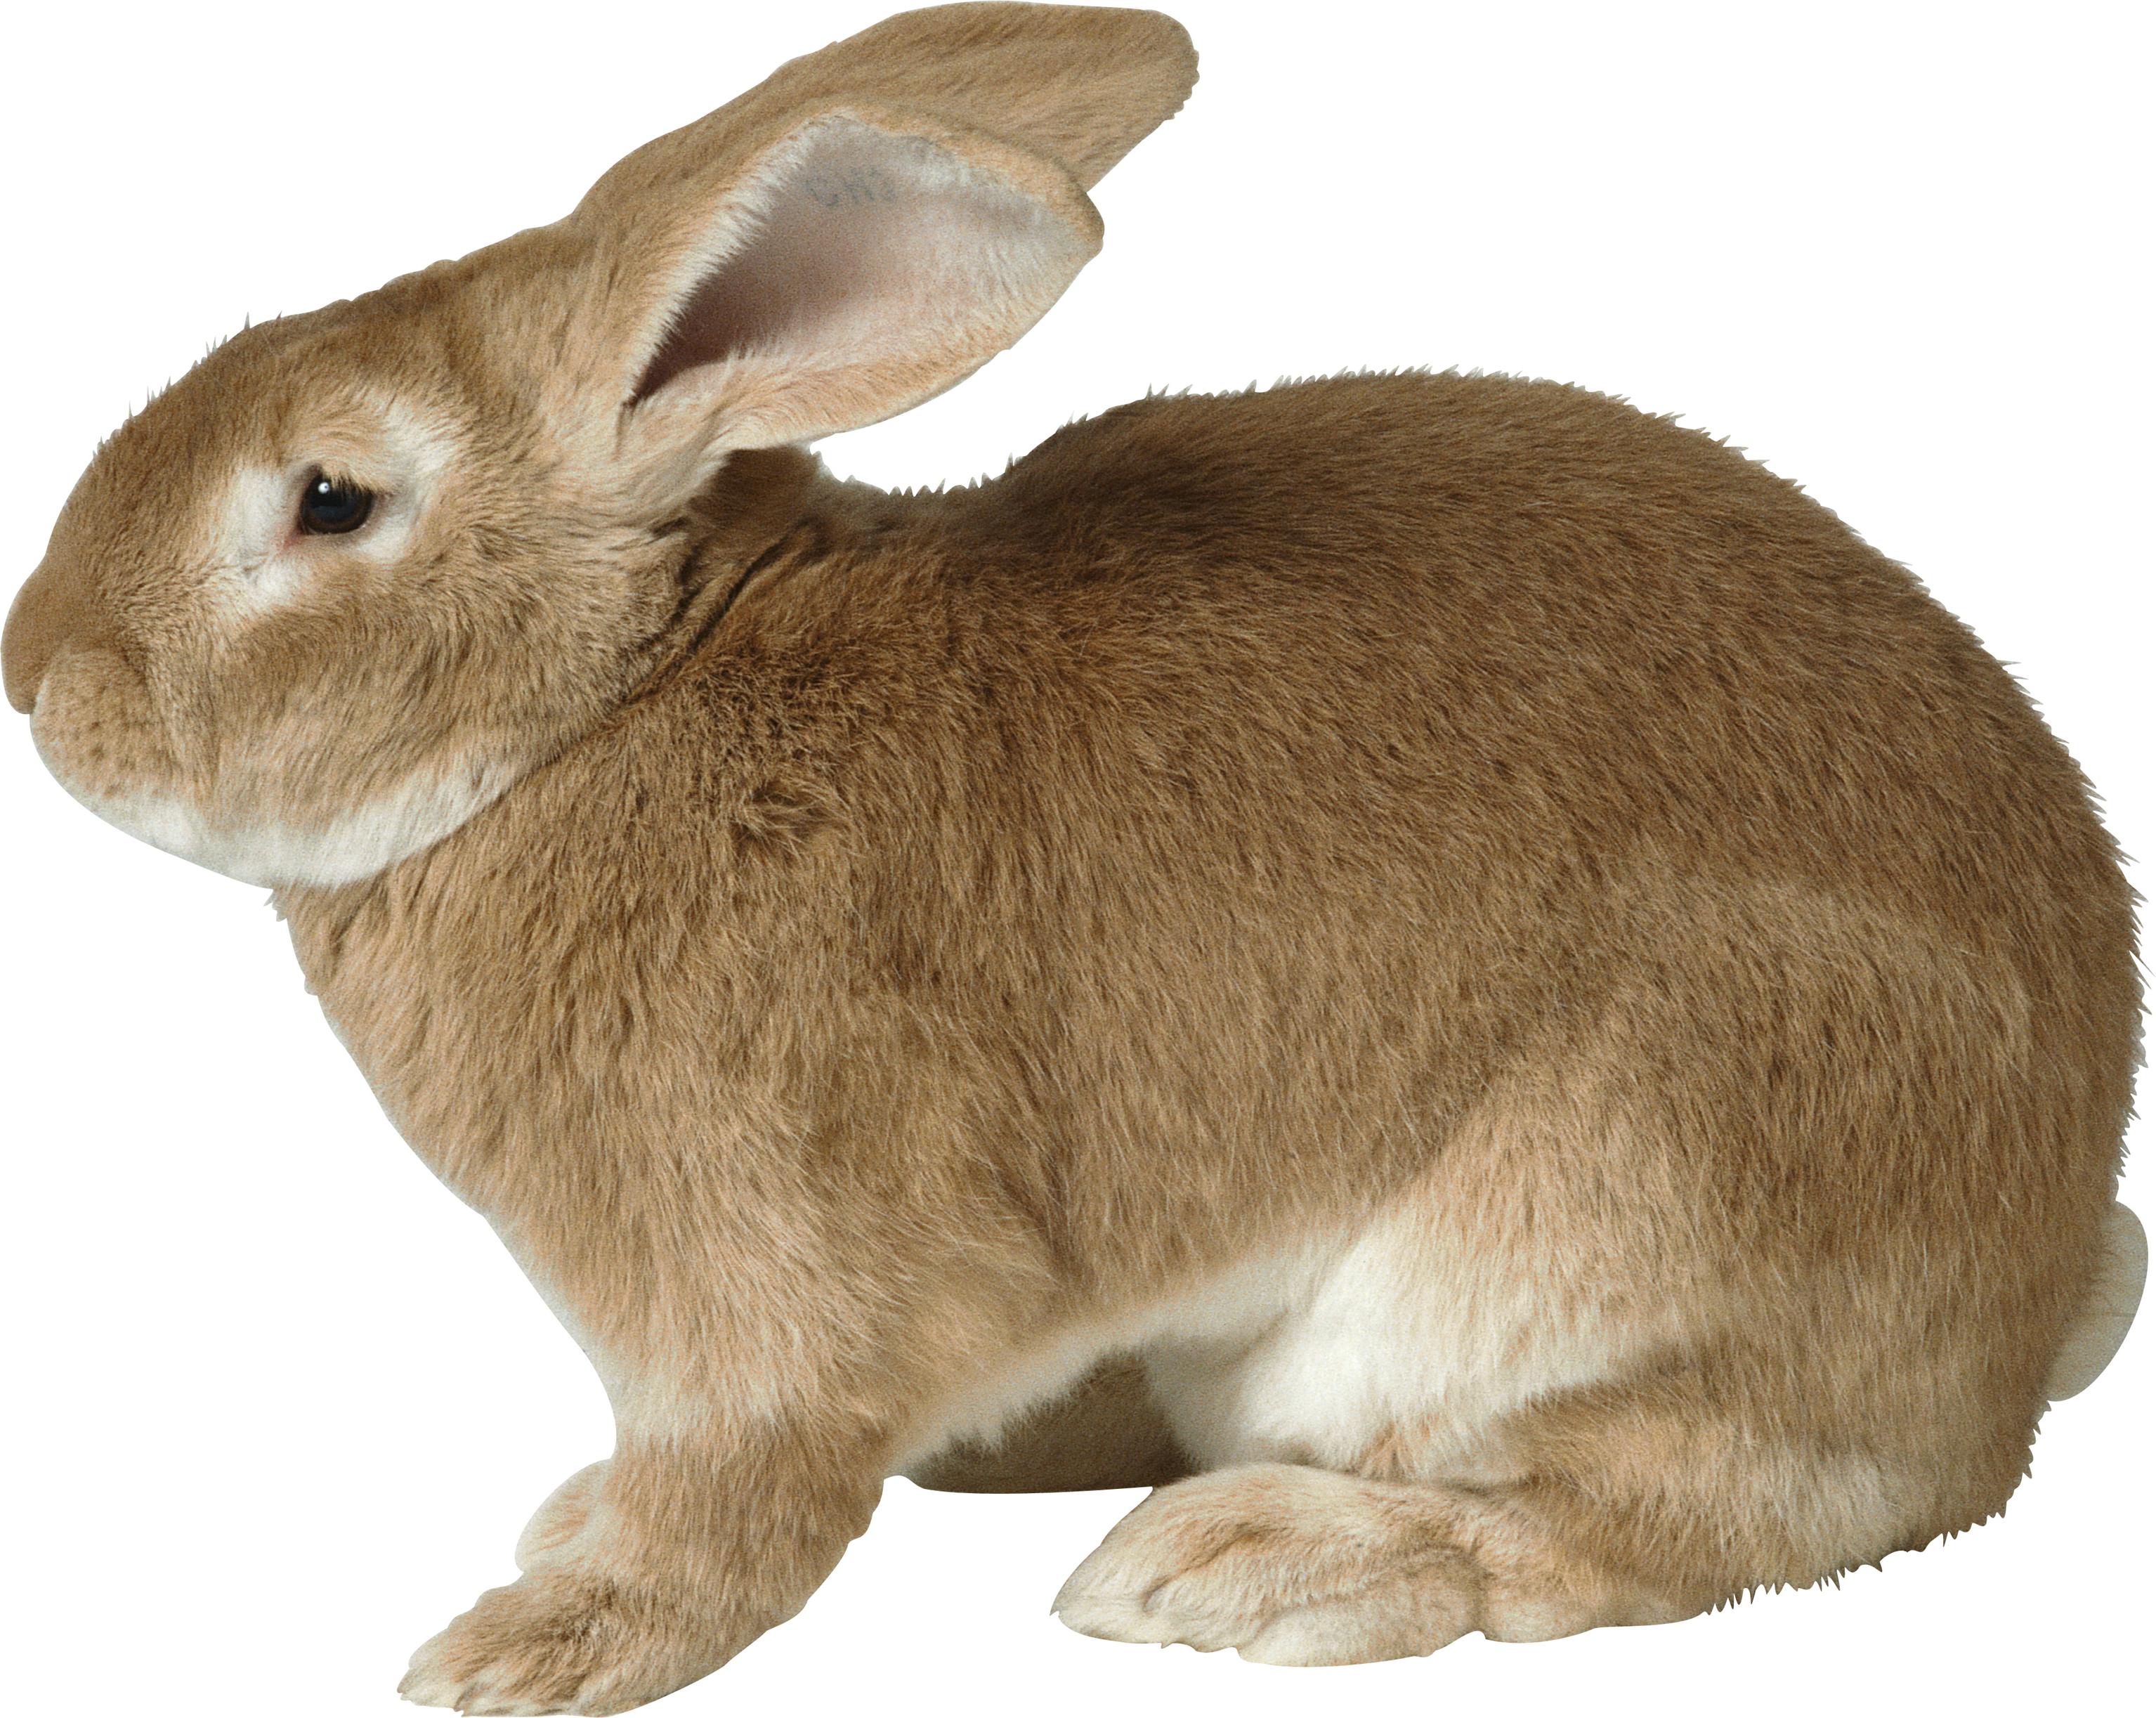 Rabbit PNG - 2874